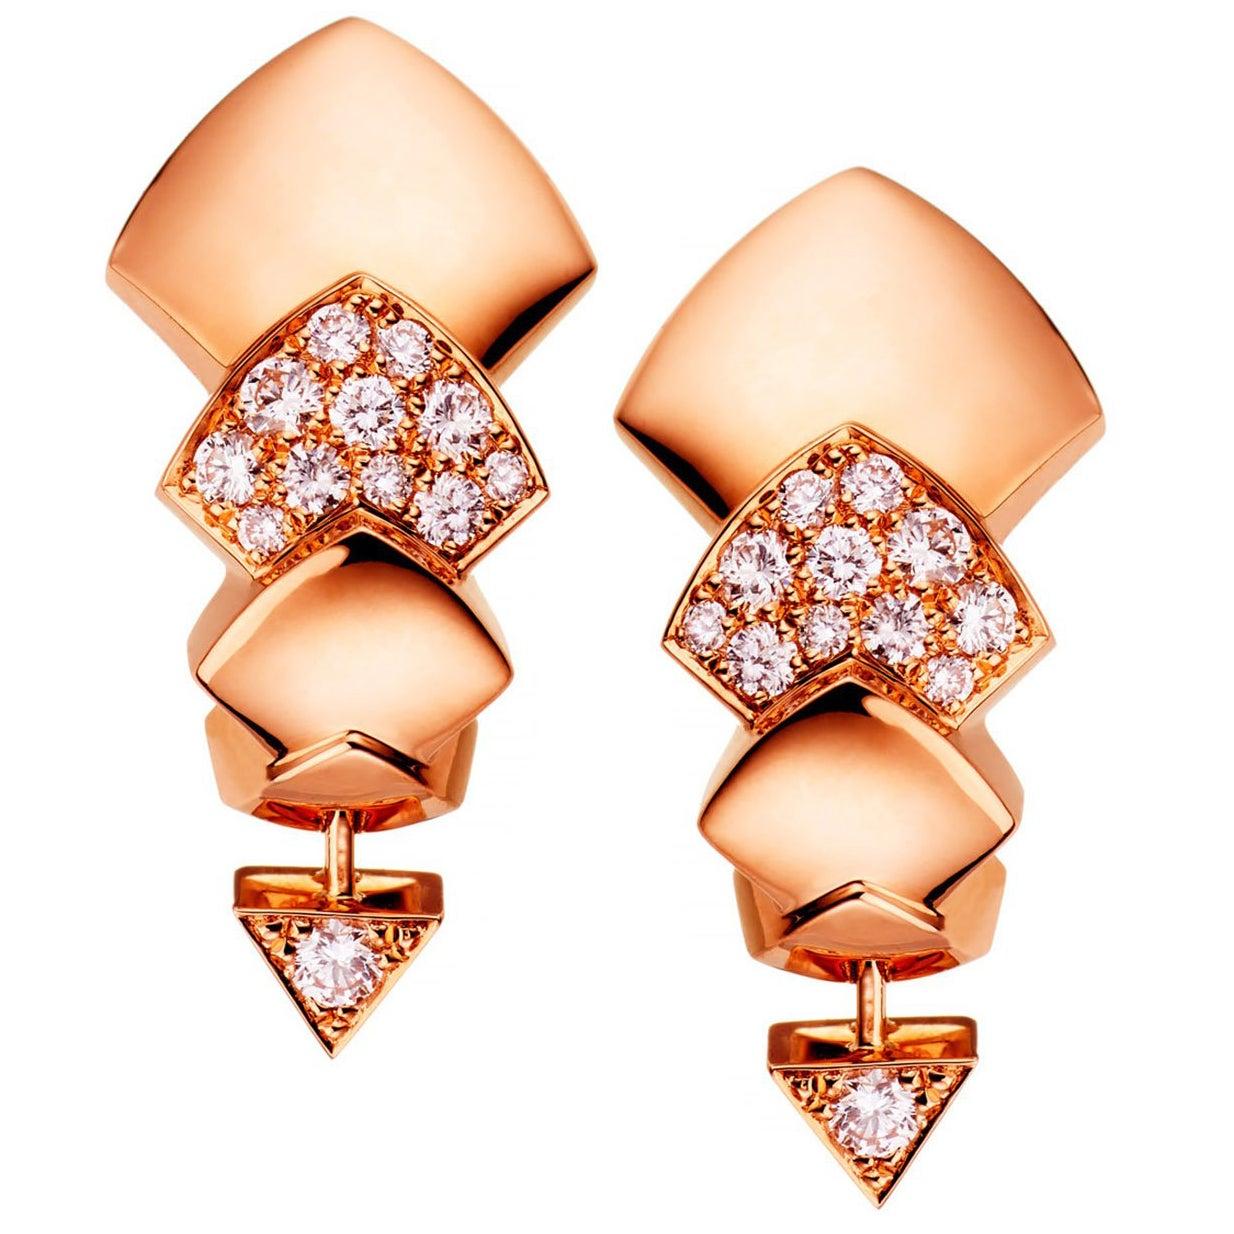 Akillis Python White Gold Diamond Pendant Earrings P1vfvvyEDS